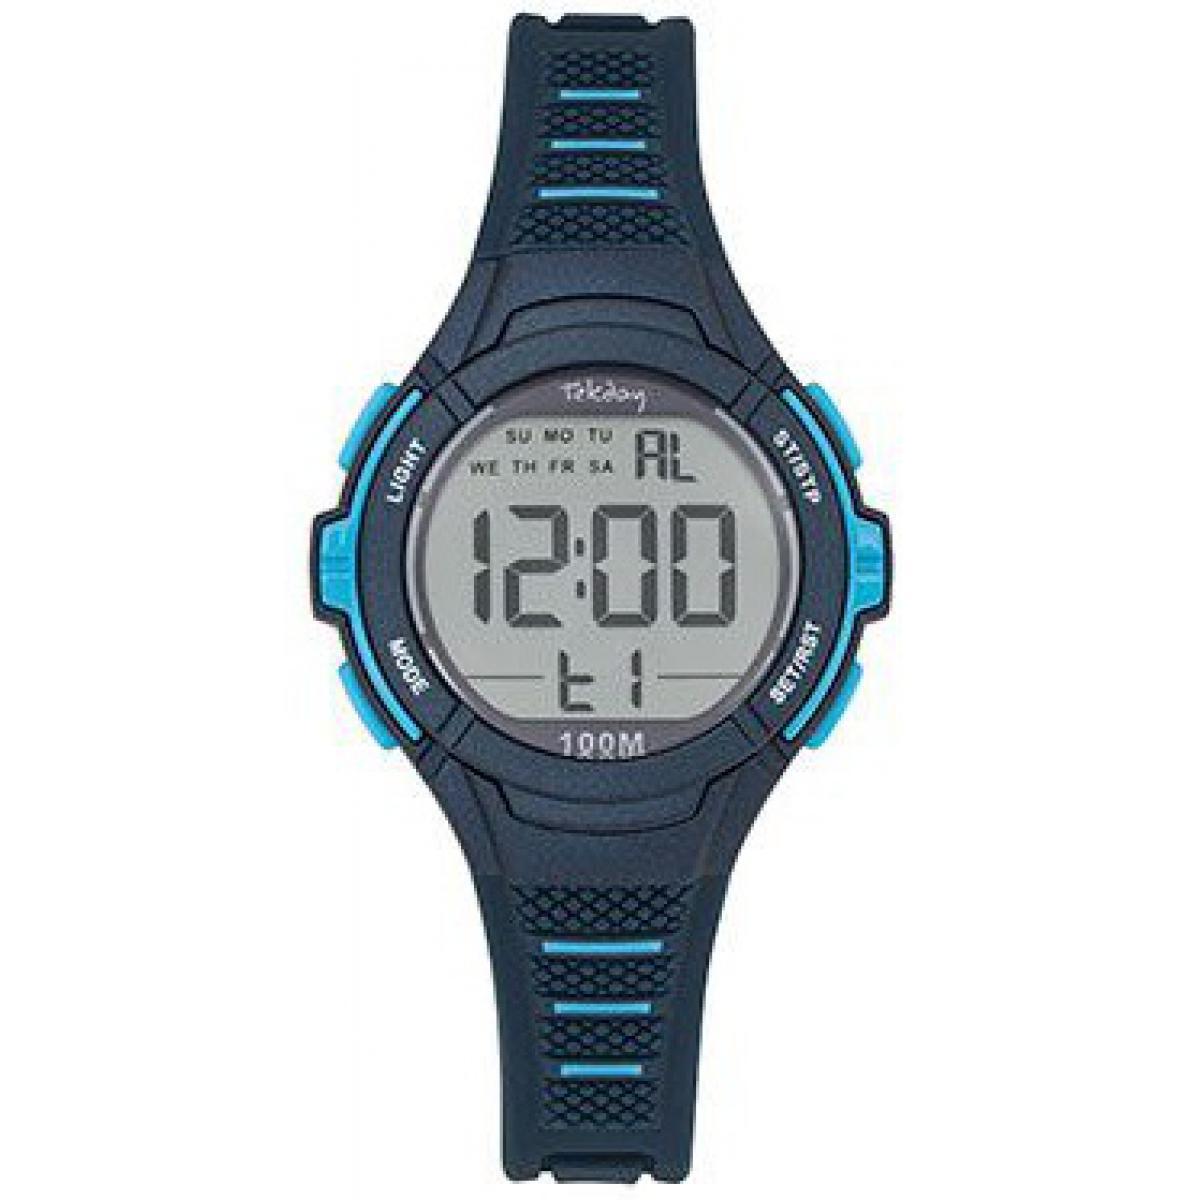 Montre Junior 654661 - Bracelet Silicone Bleu Boitier Silicone Bleu - Tekday - Modalova